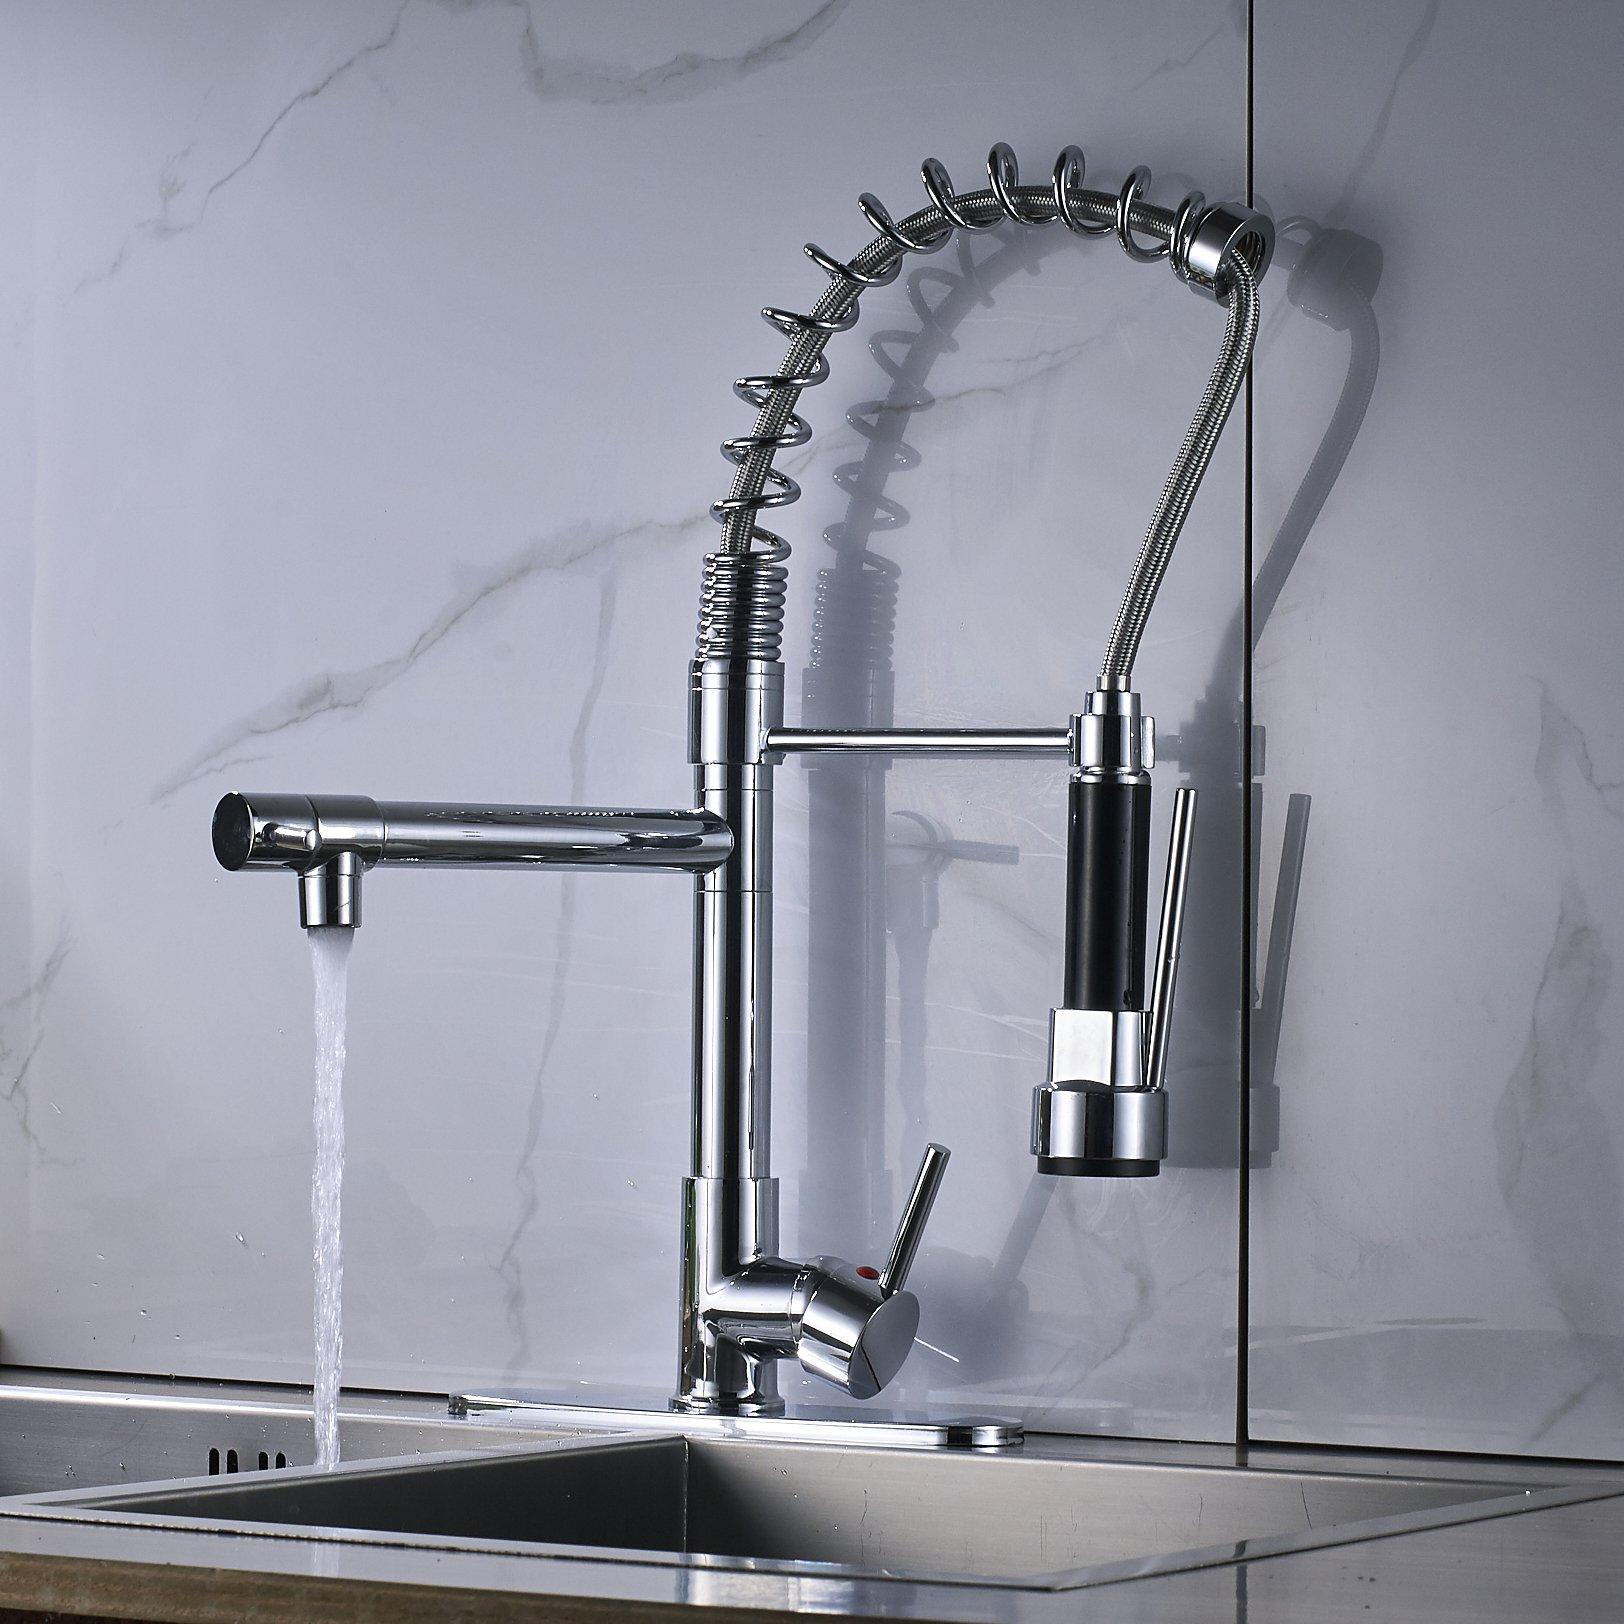 Rozin Chrome Finish LED Light Sprayer Kitchen Sink Faucet Spring Swivel Spout Mixer Tap by Rozin (Image #5)